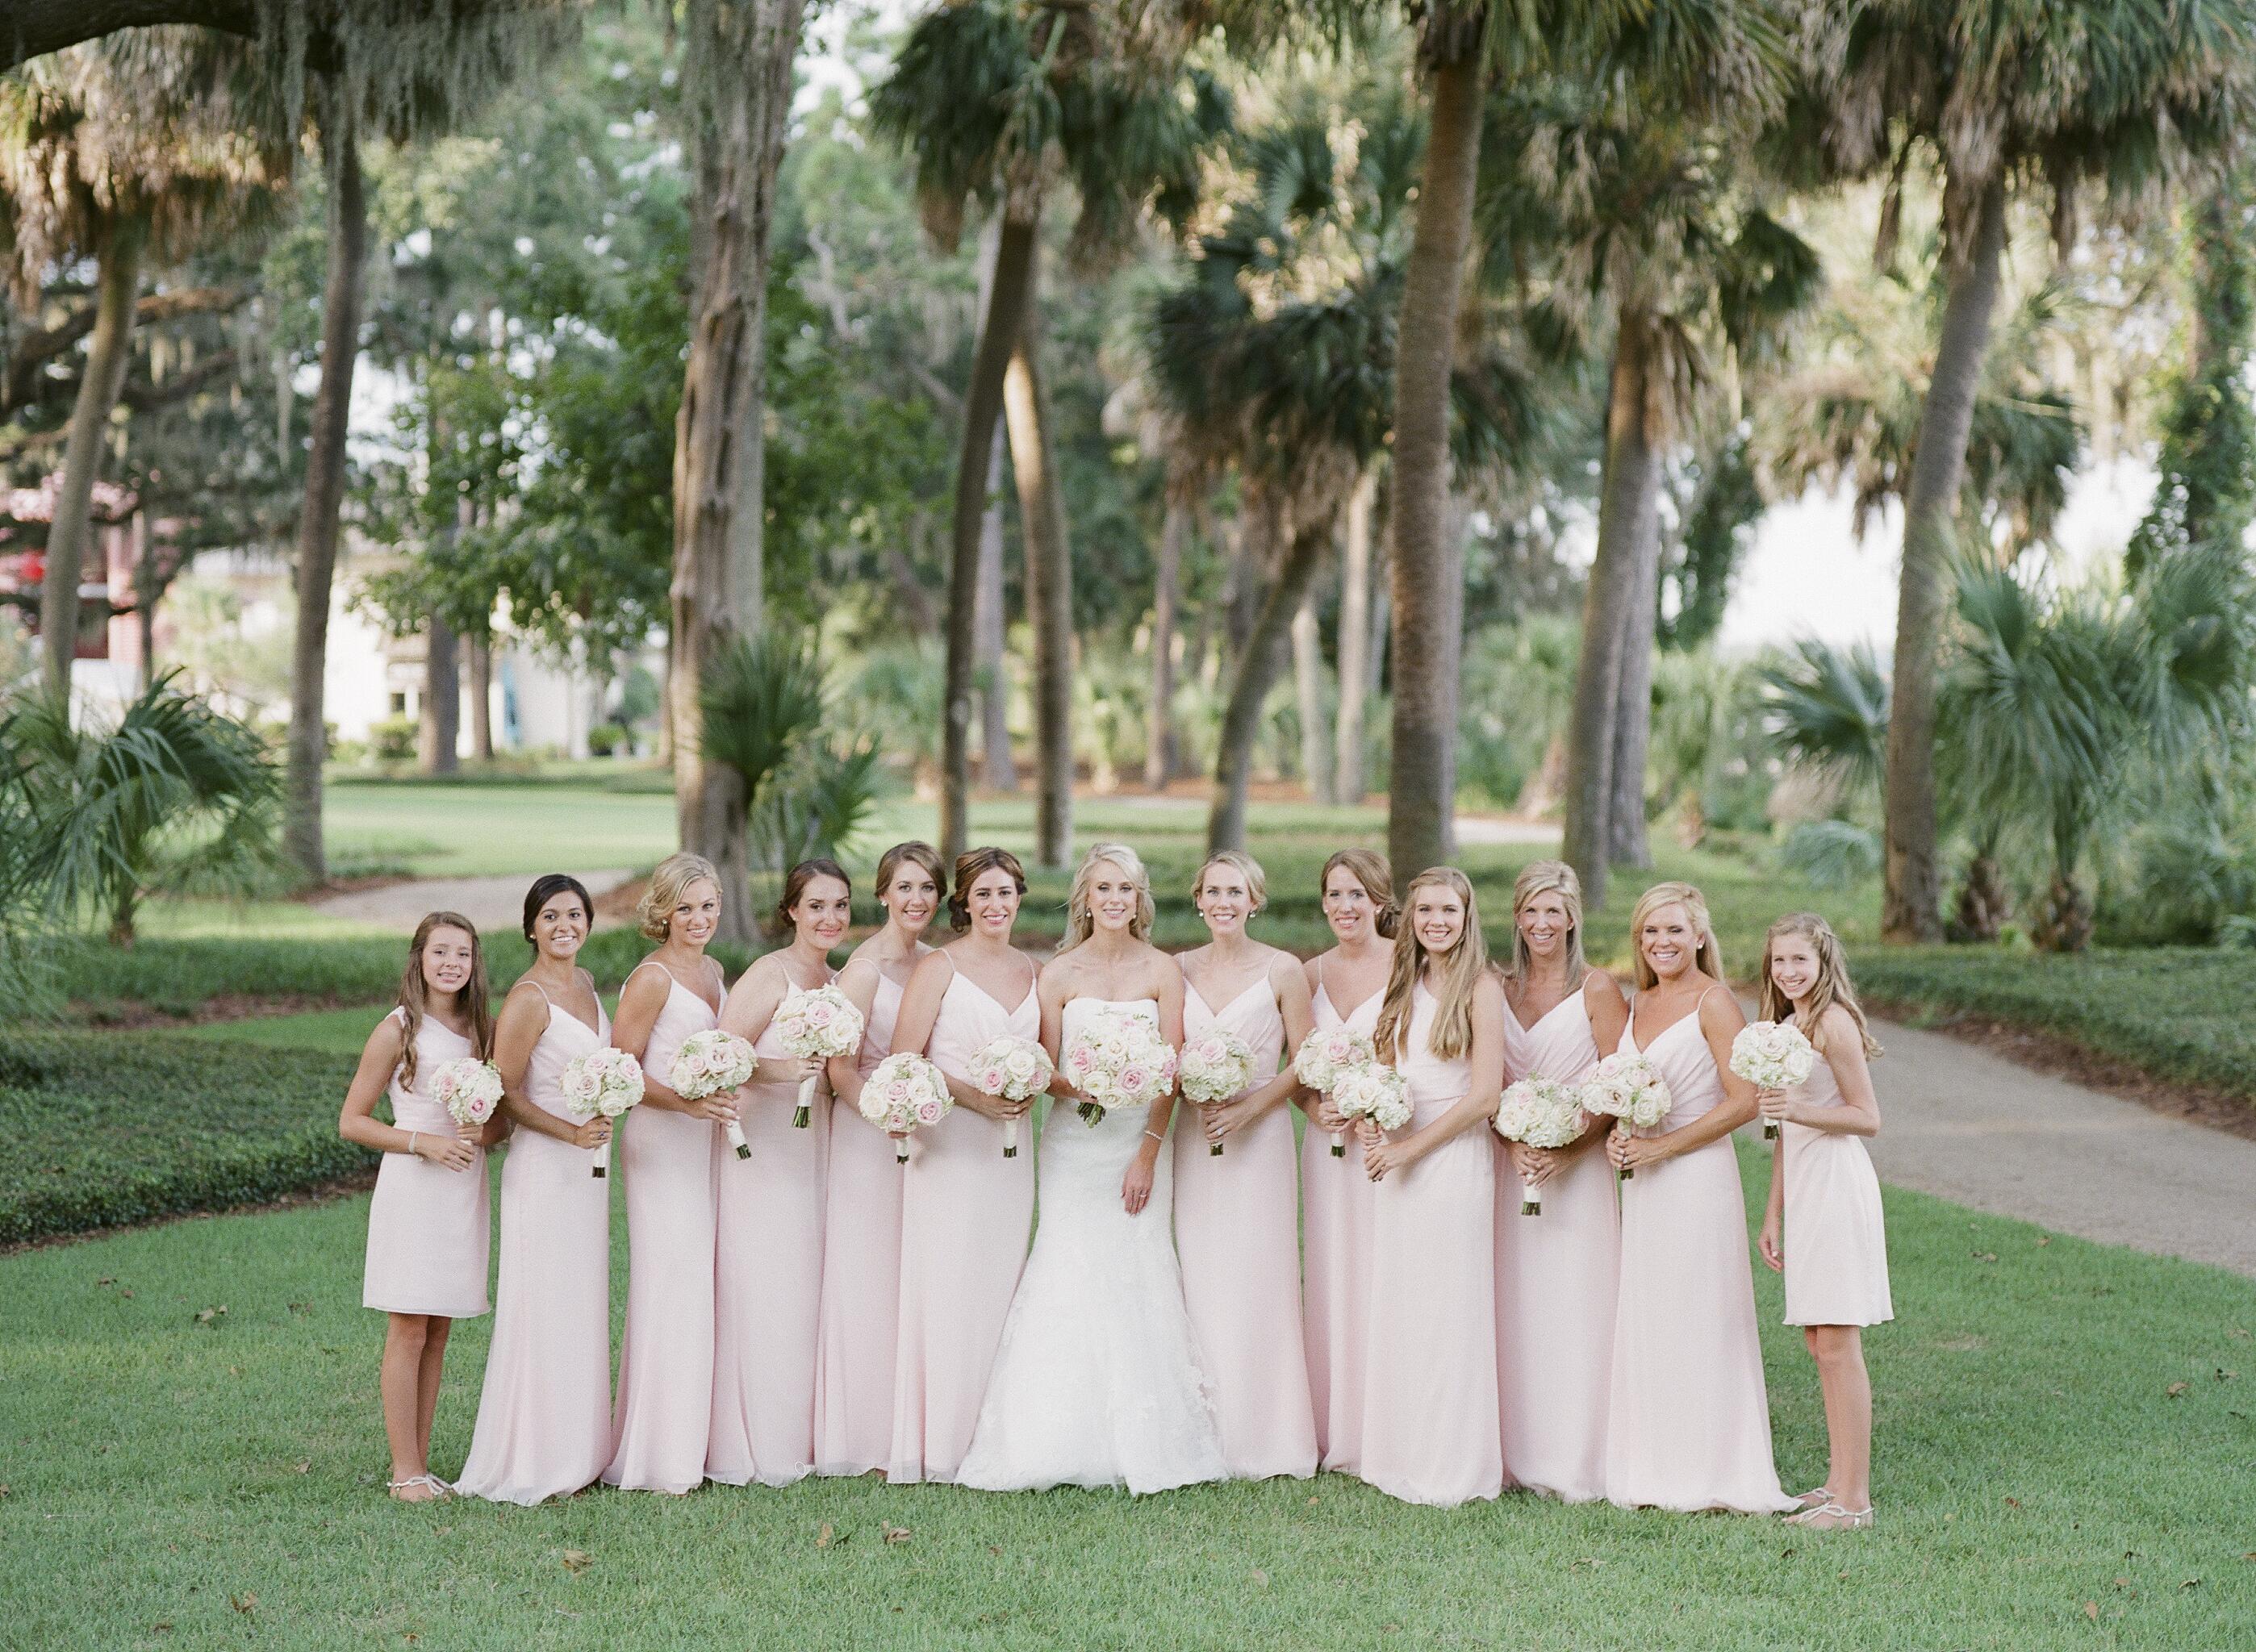 Pink Jim Hjelm Bridesmaids